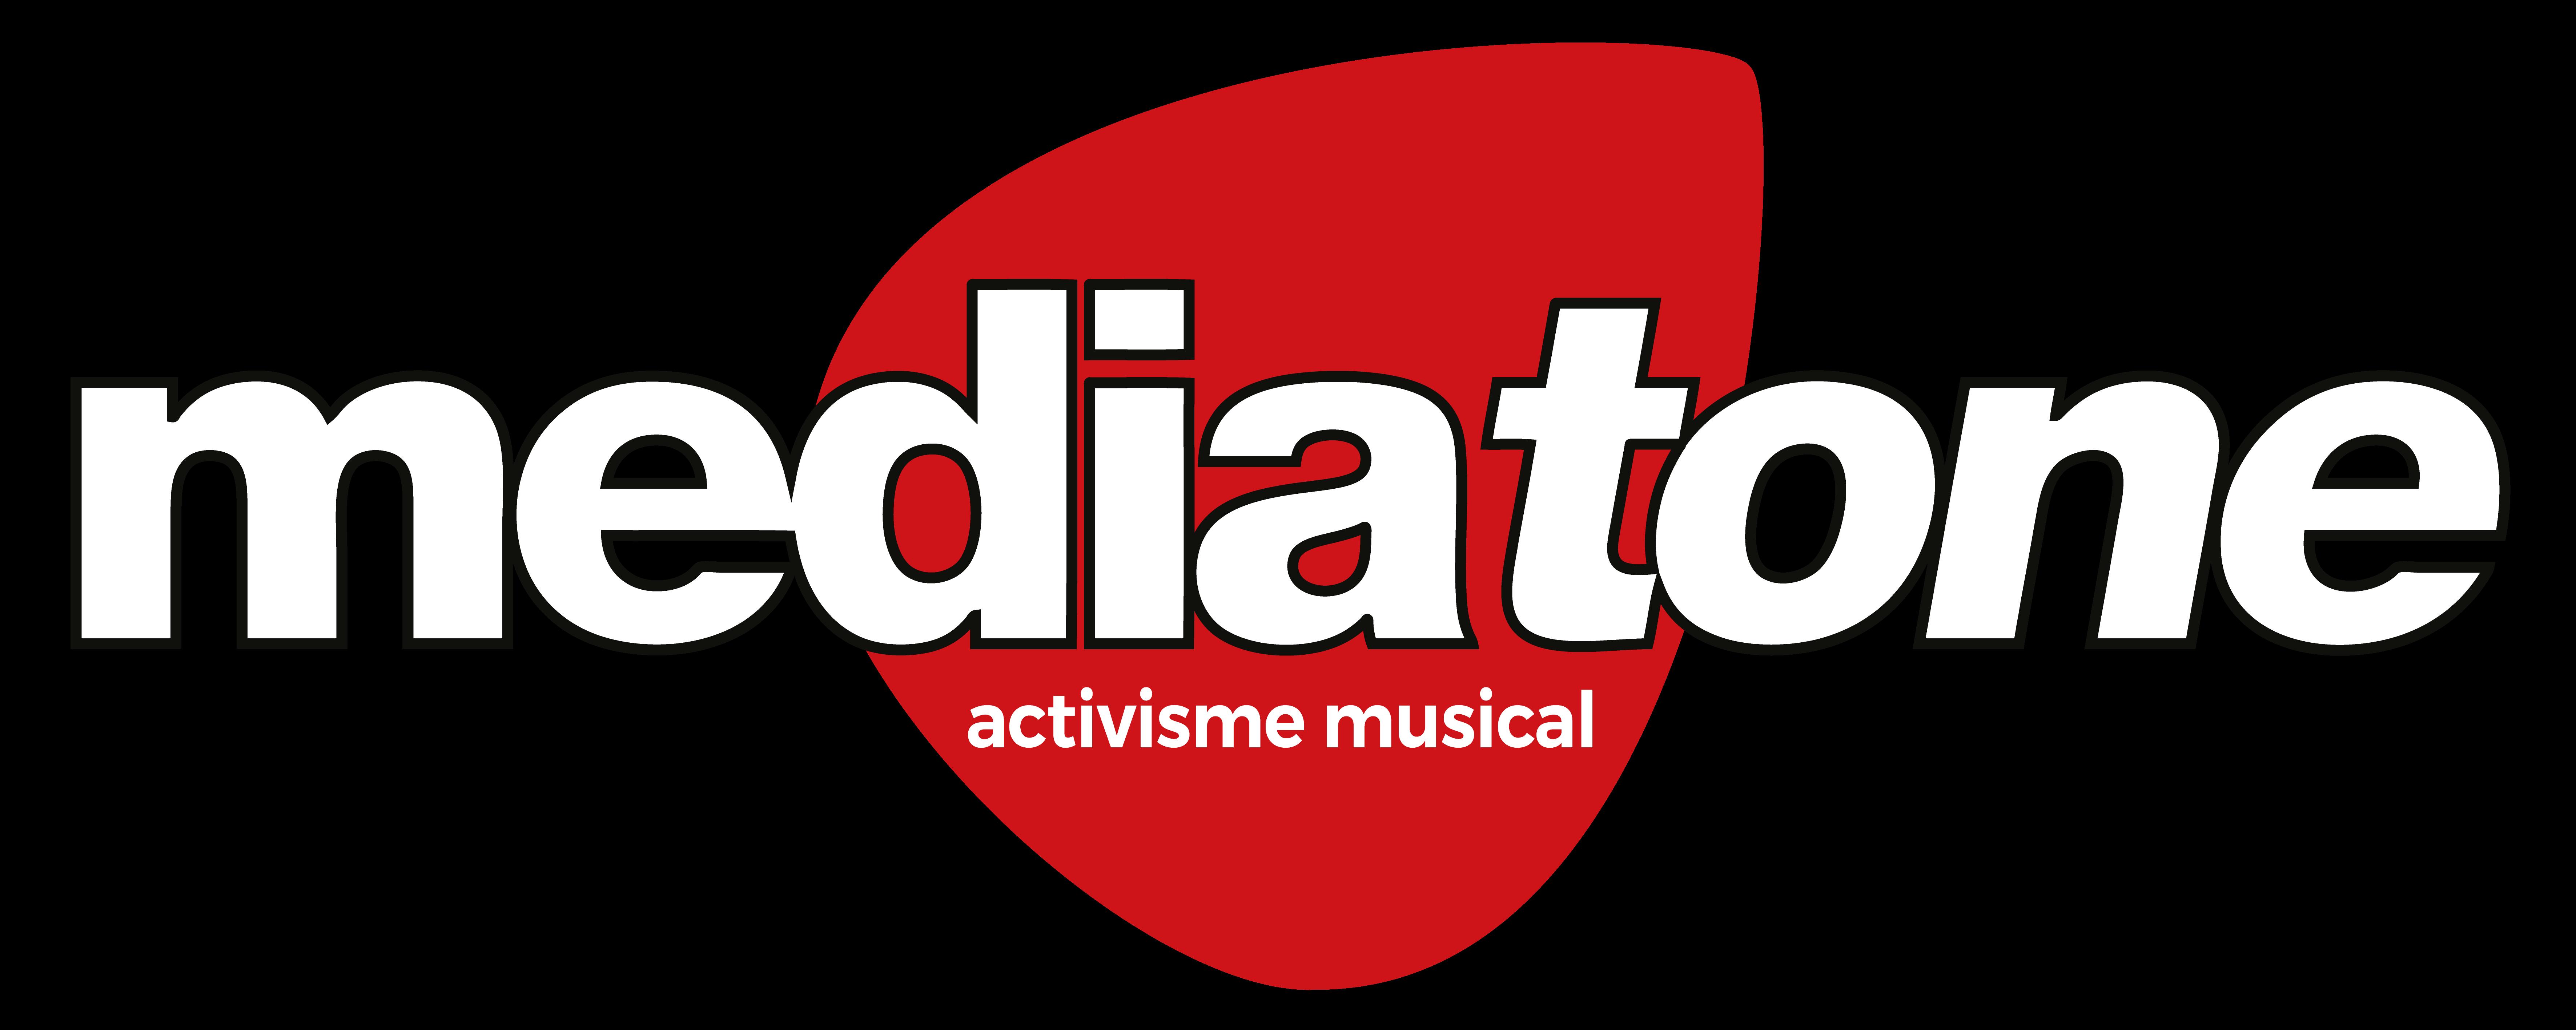 _Mediatone-logo-activisme-musical